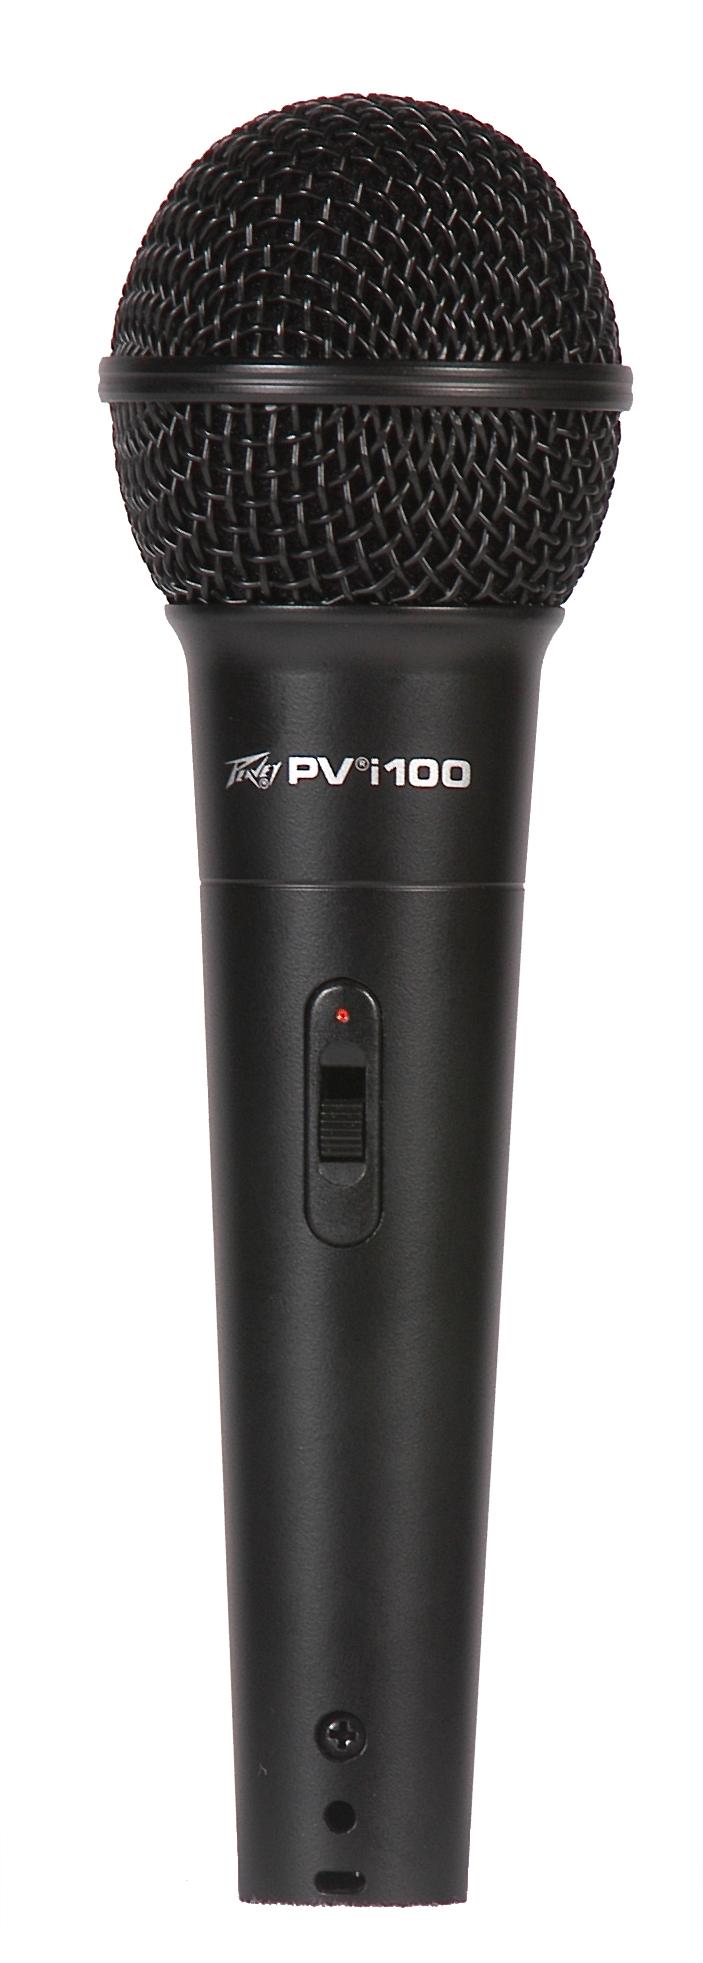 Peavey Microphone Pvi 100 Madison